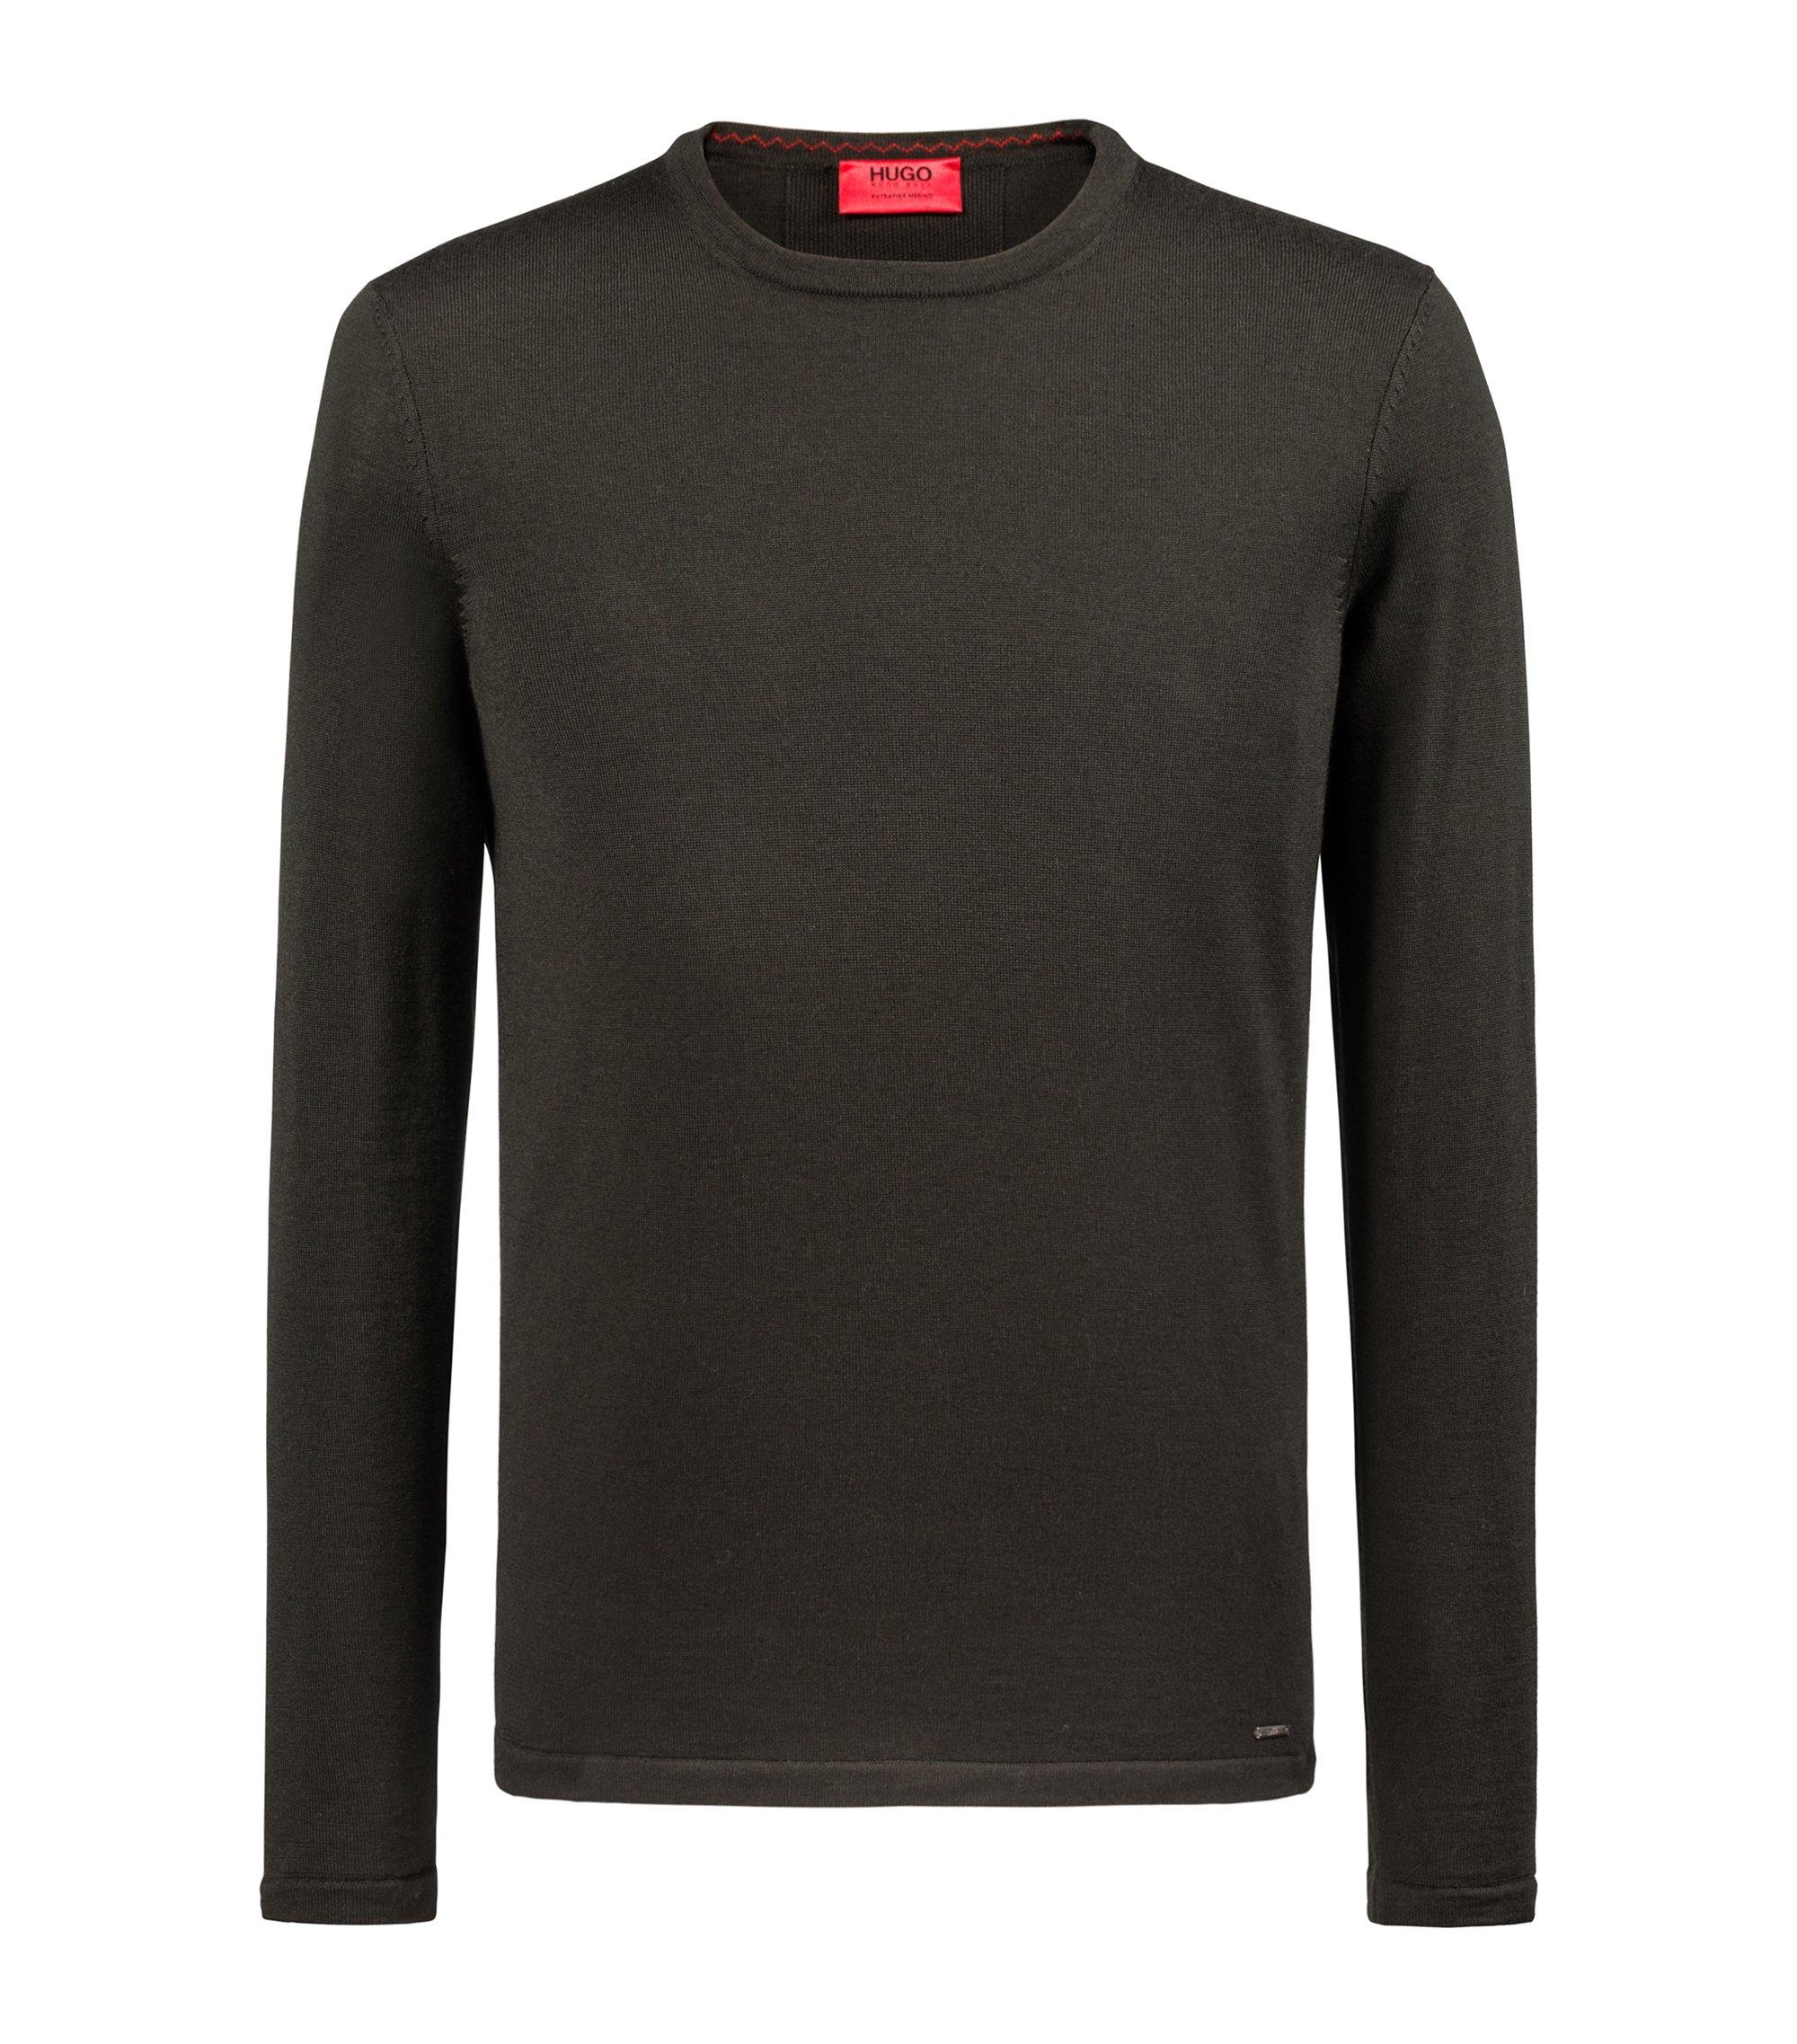 Crew-neck sweater in Merino wool, Dark Green